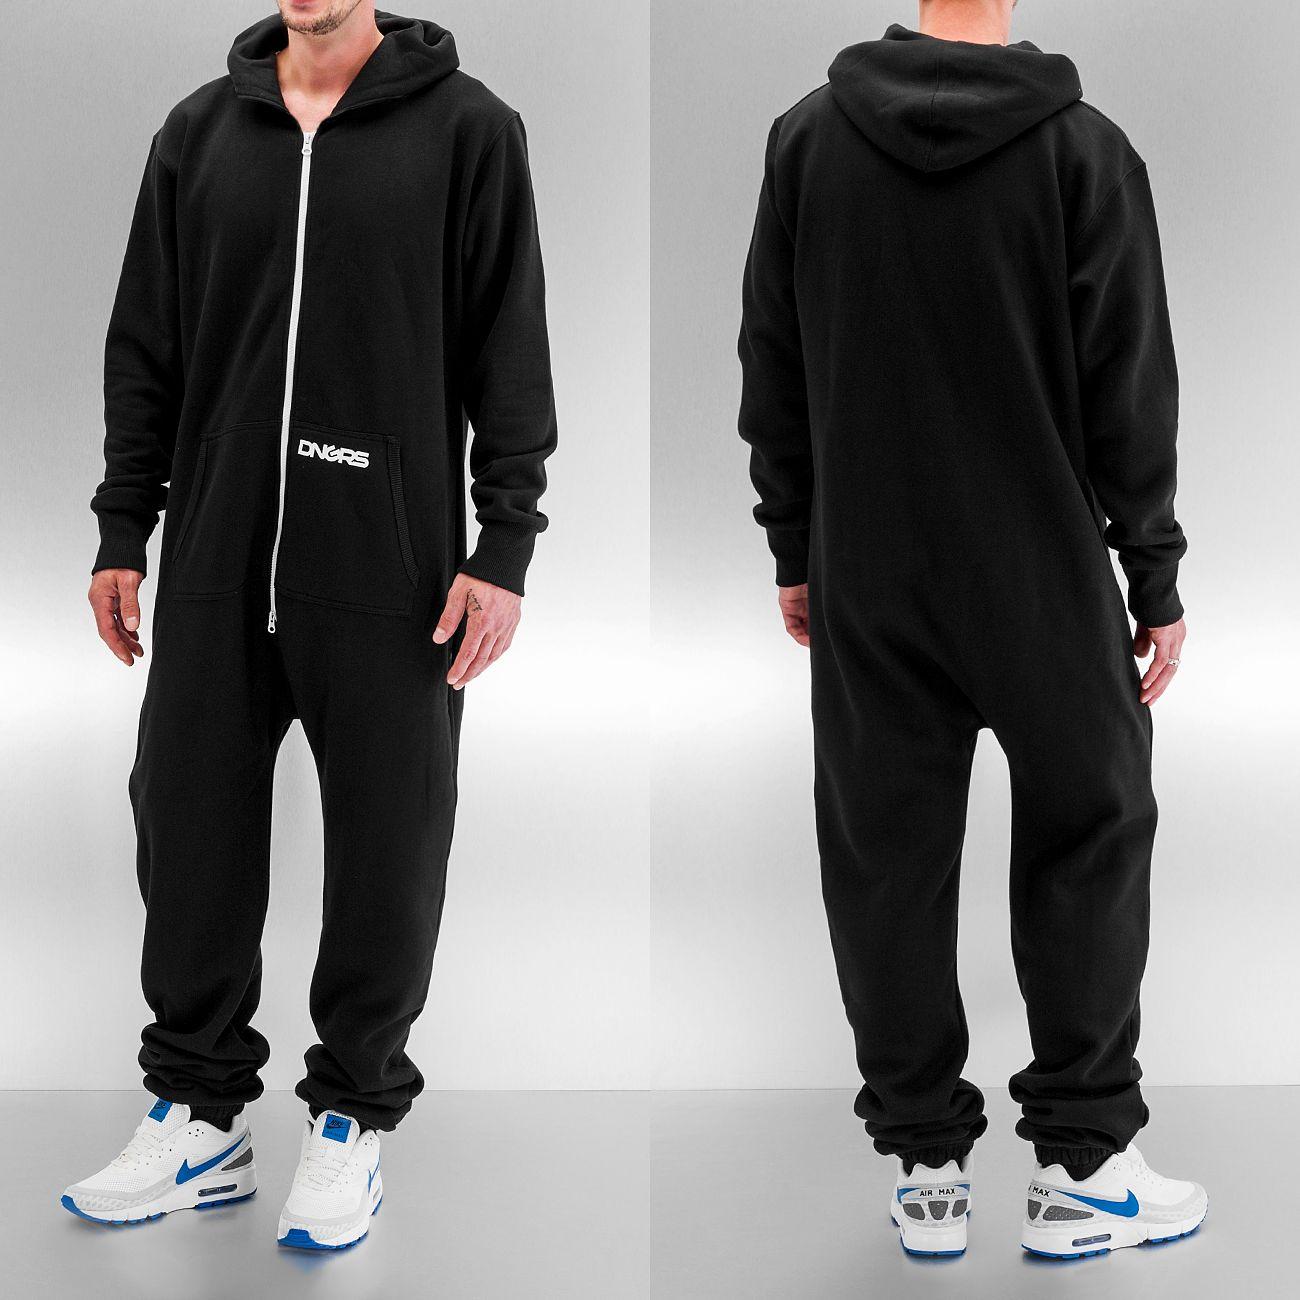 dangerous dngrs overall jumpsuit black herren komplett anzug ebay. Black Bedroom Furniture Sets. Home Design Ideas